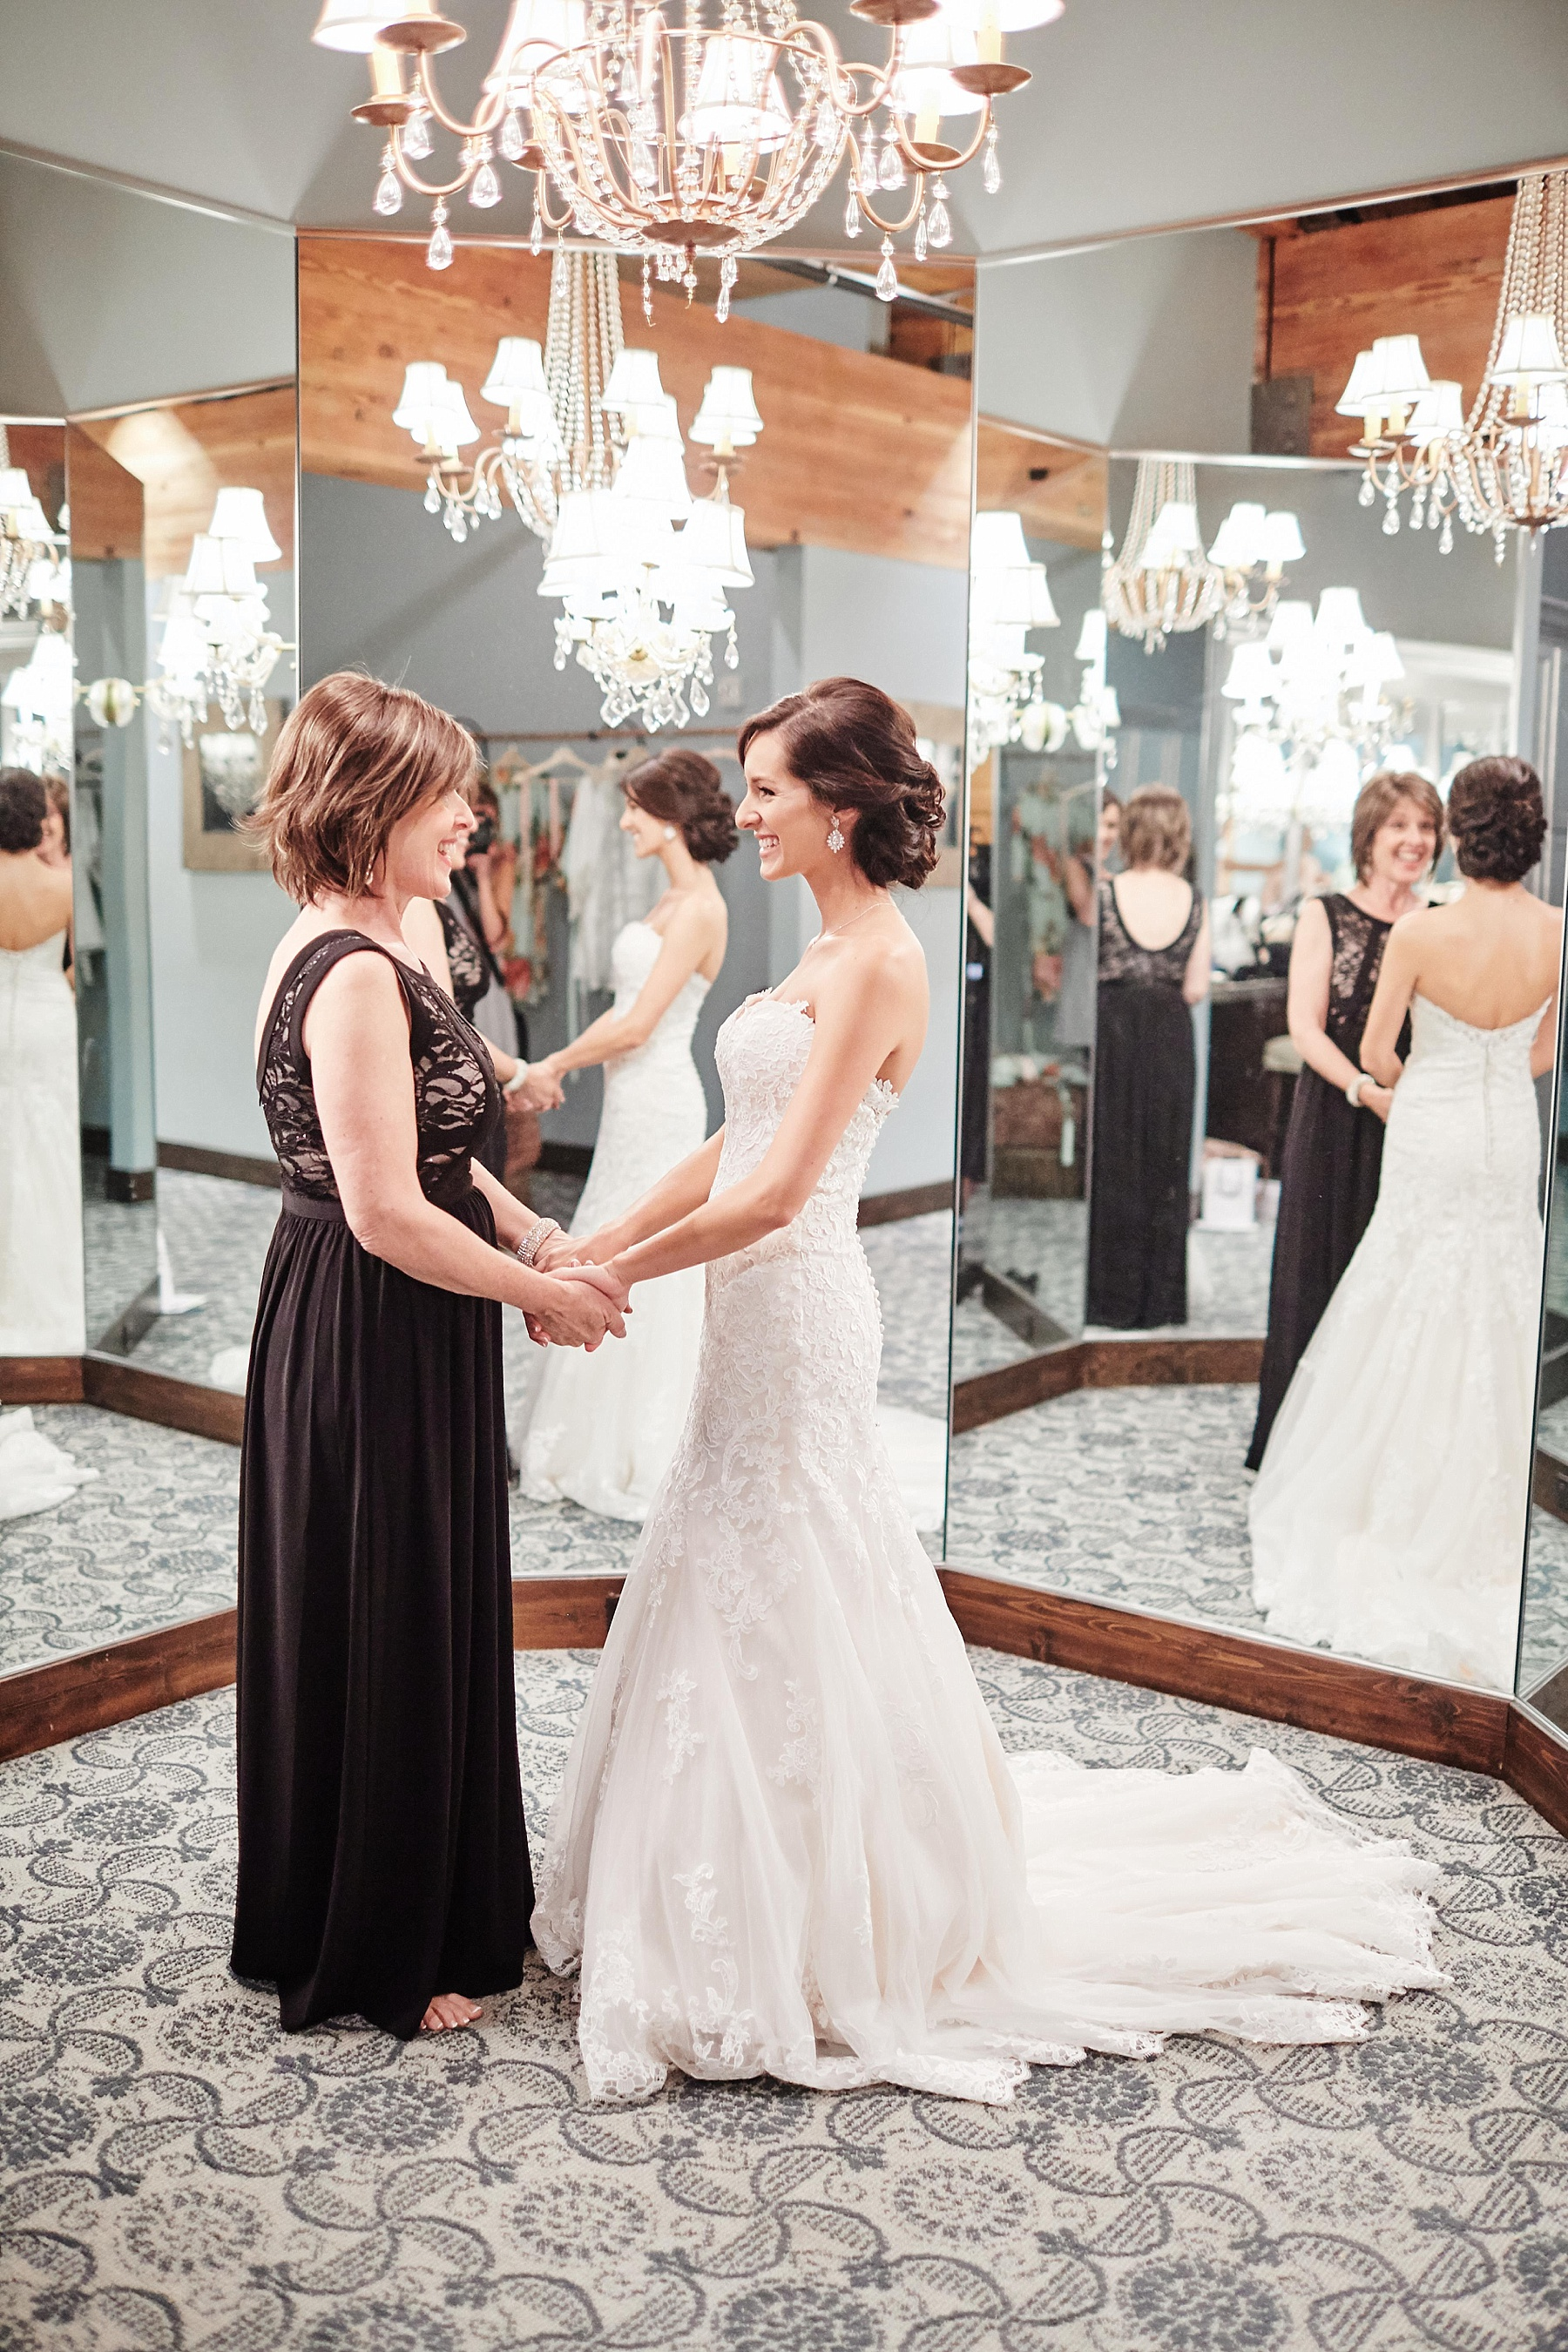 ABULAE-Wedding-Saint-paul-MN-Josh-Sofia-Wedding-Mears-Park_0731.jpg